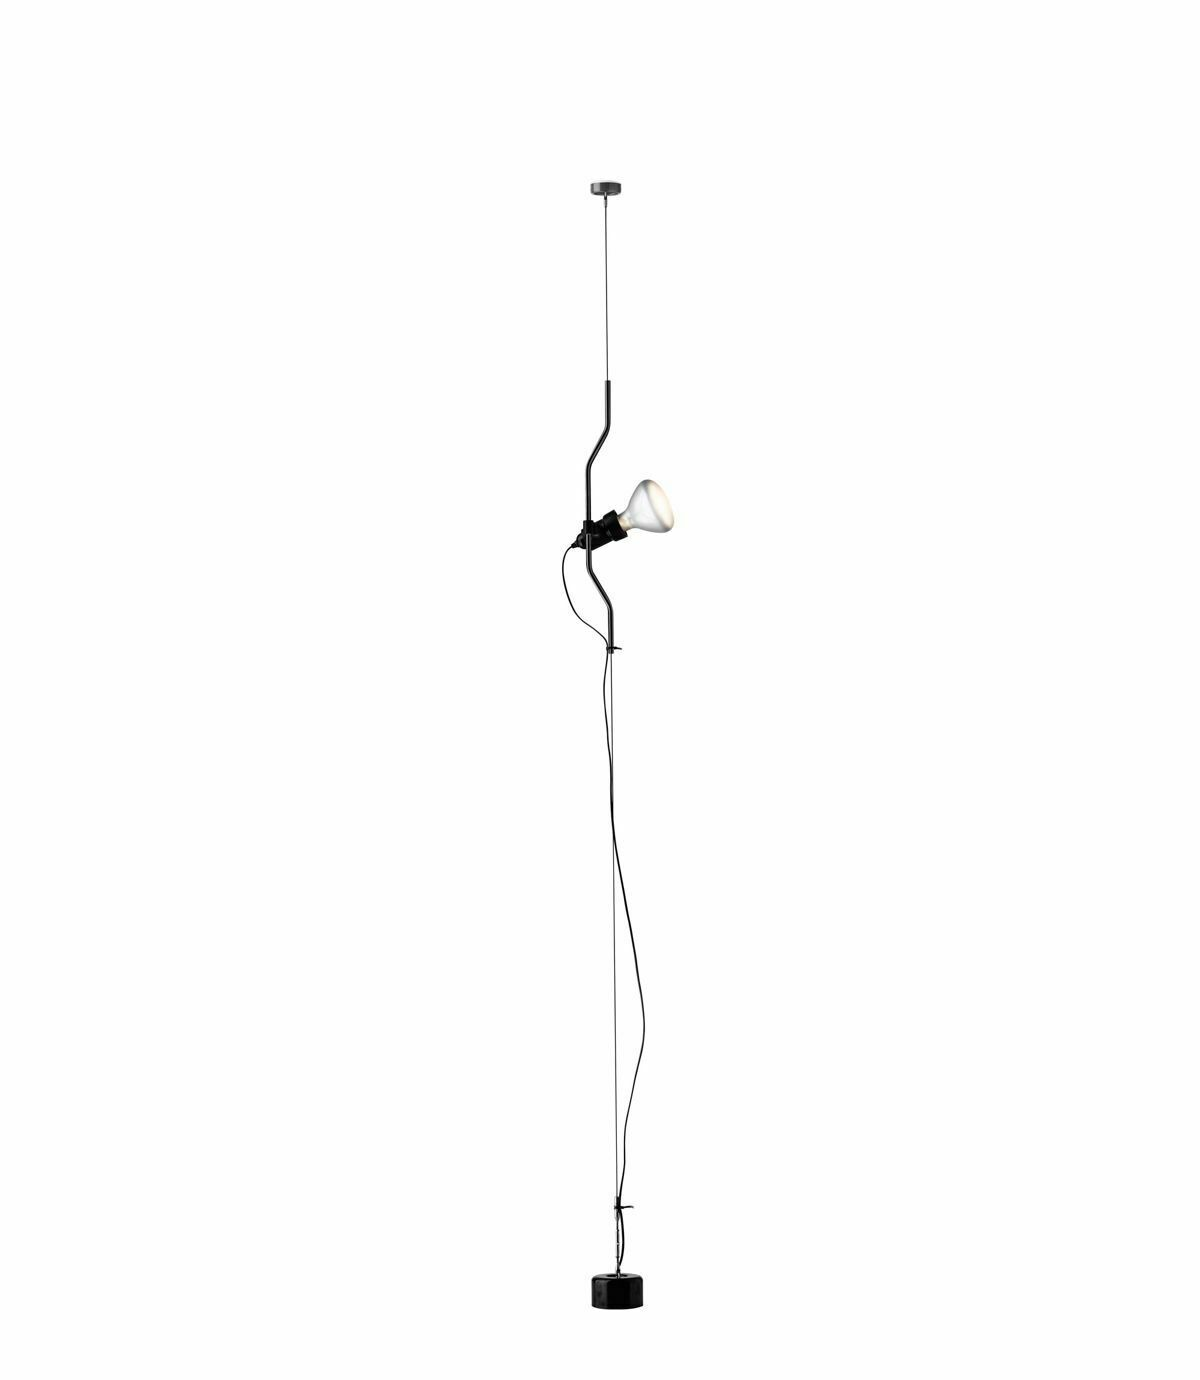 Flos-Parentesi-Sospensione-Nero-F5400030-LAMPADINA-LED-INCLUSA-ONOFF-153807767577